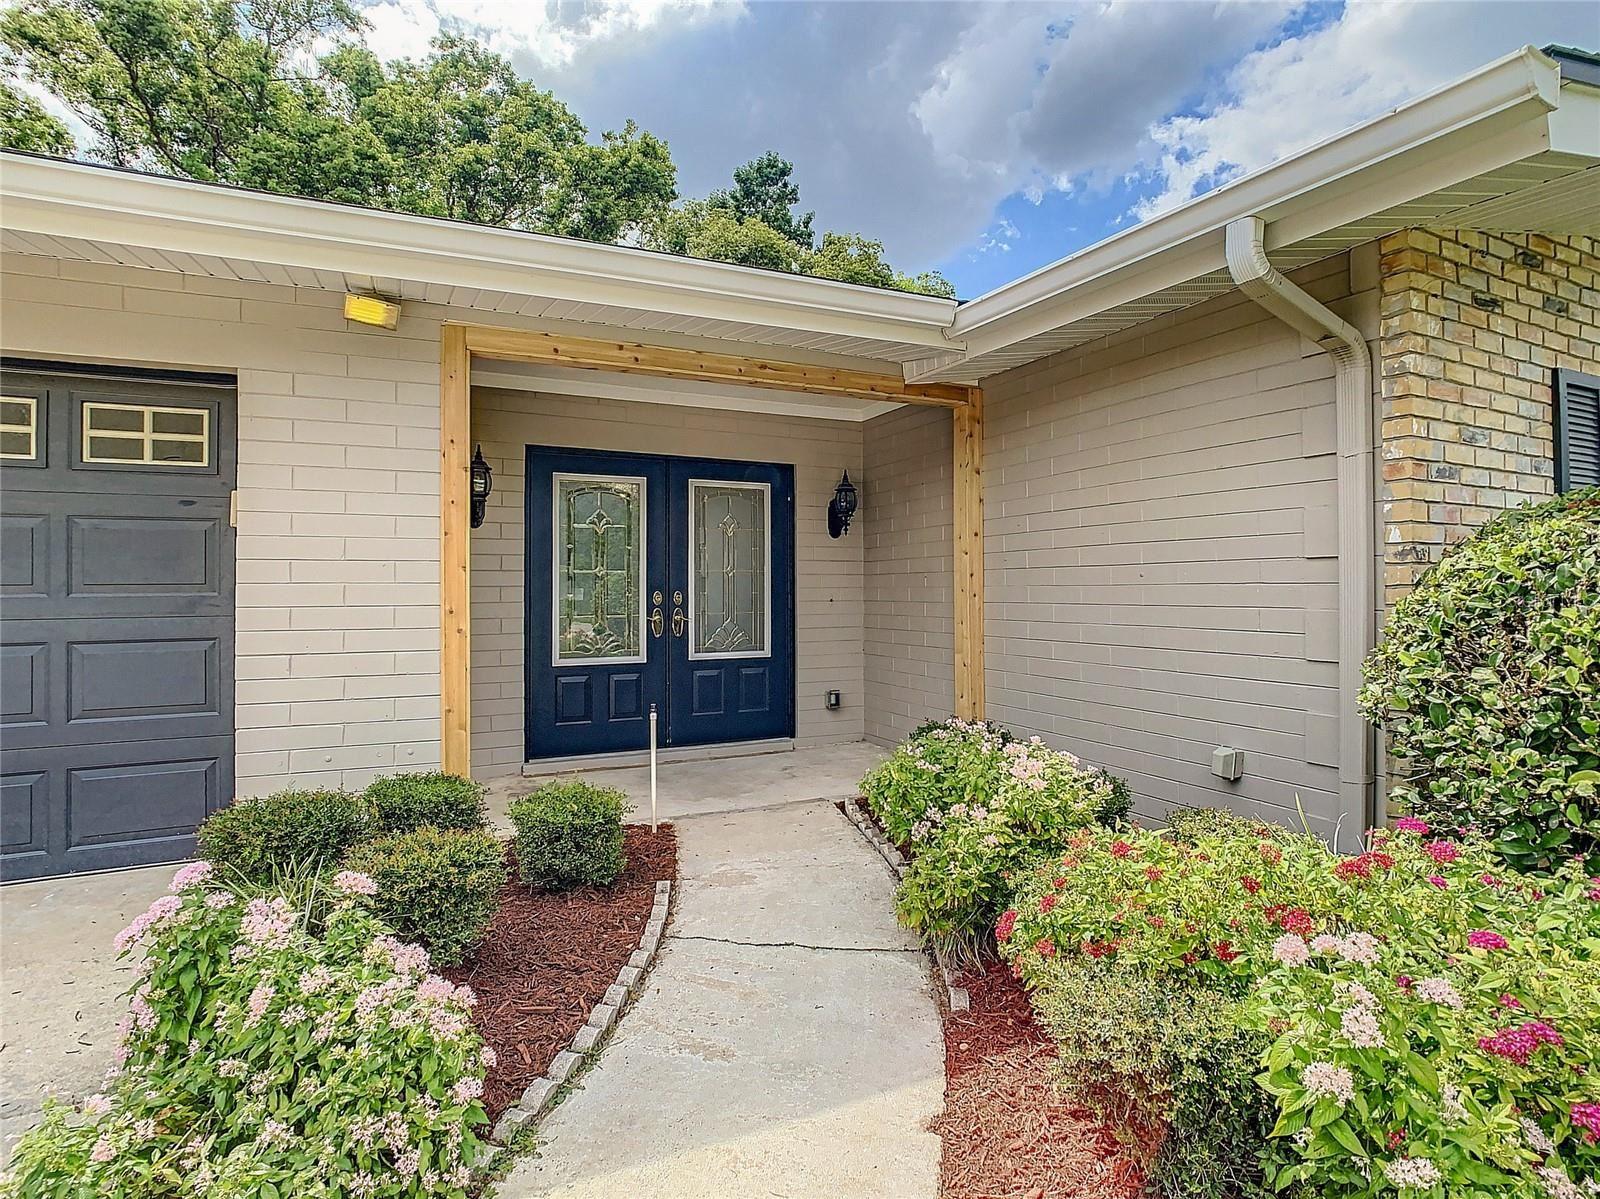 406 SILVER OAK LANE, Altamonte Springs, FL 32701 - #: O5962454